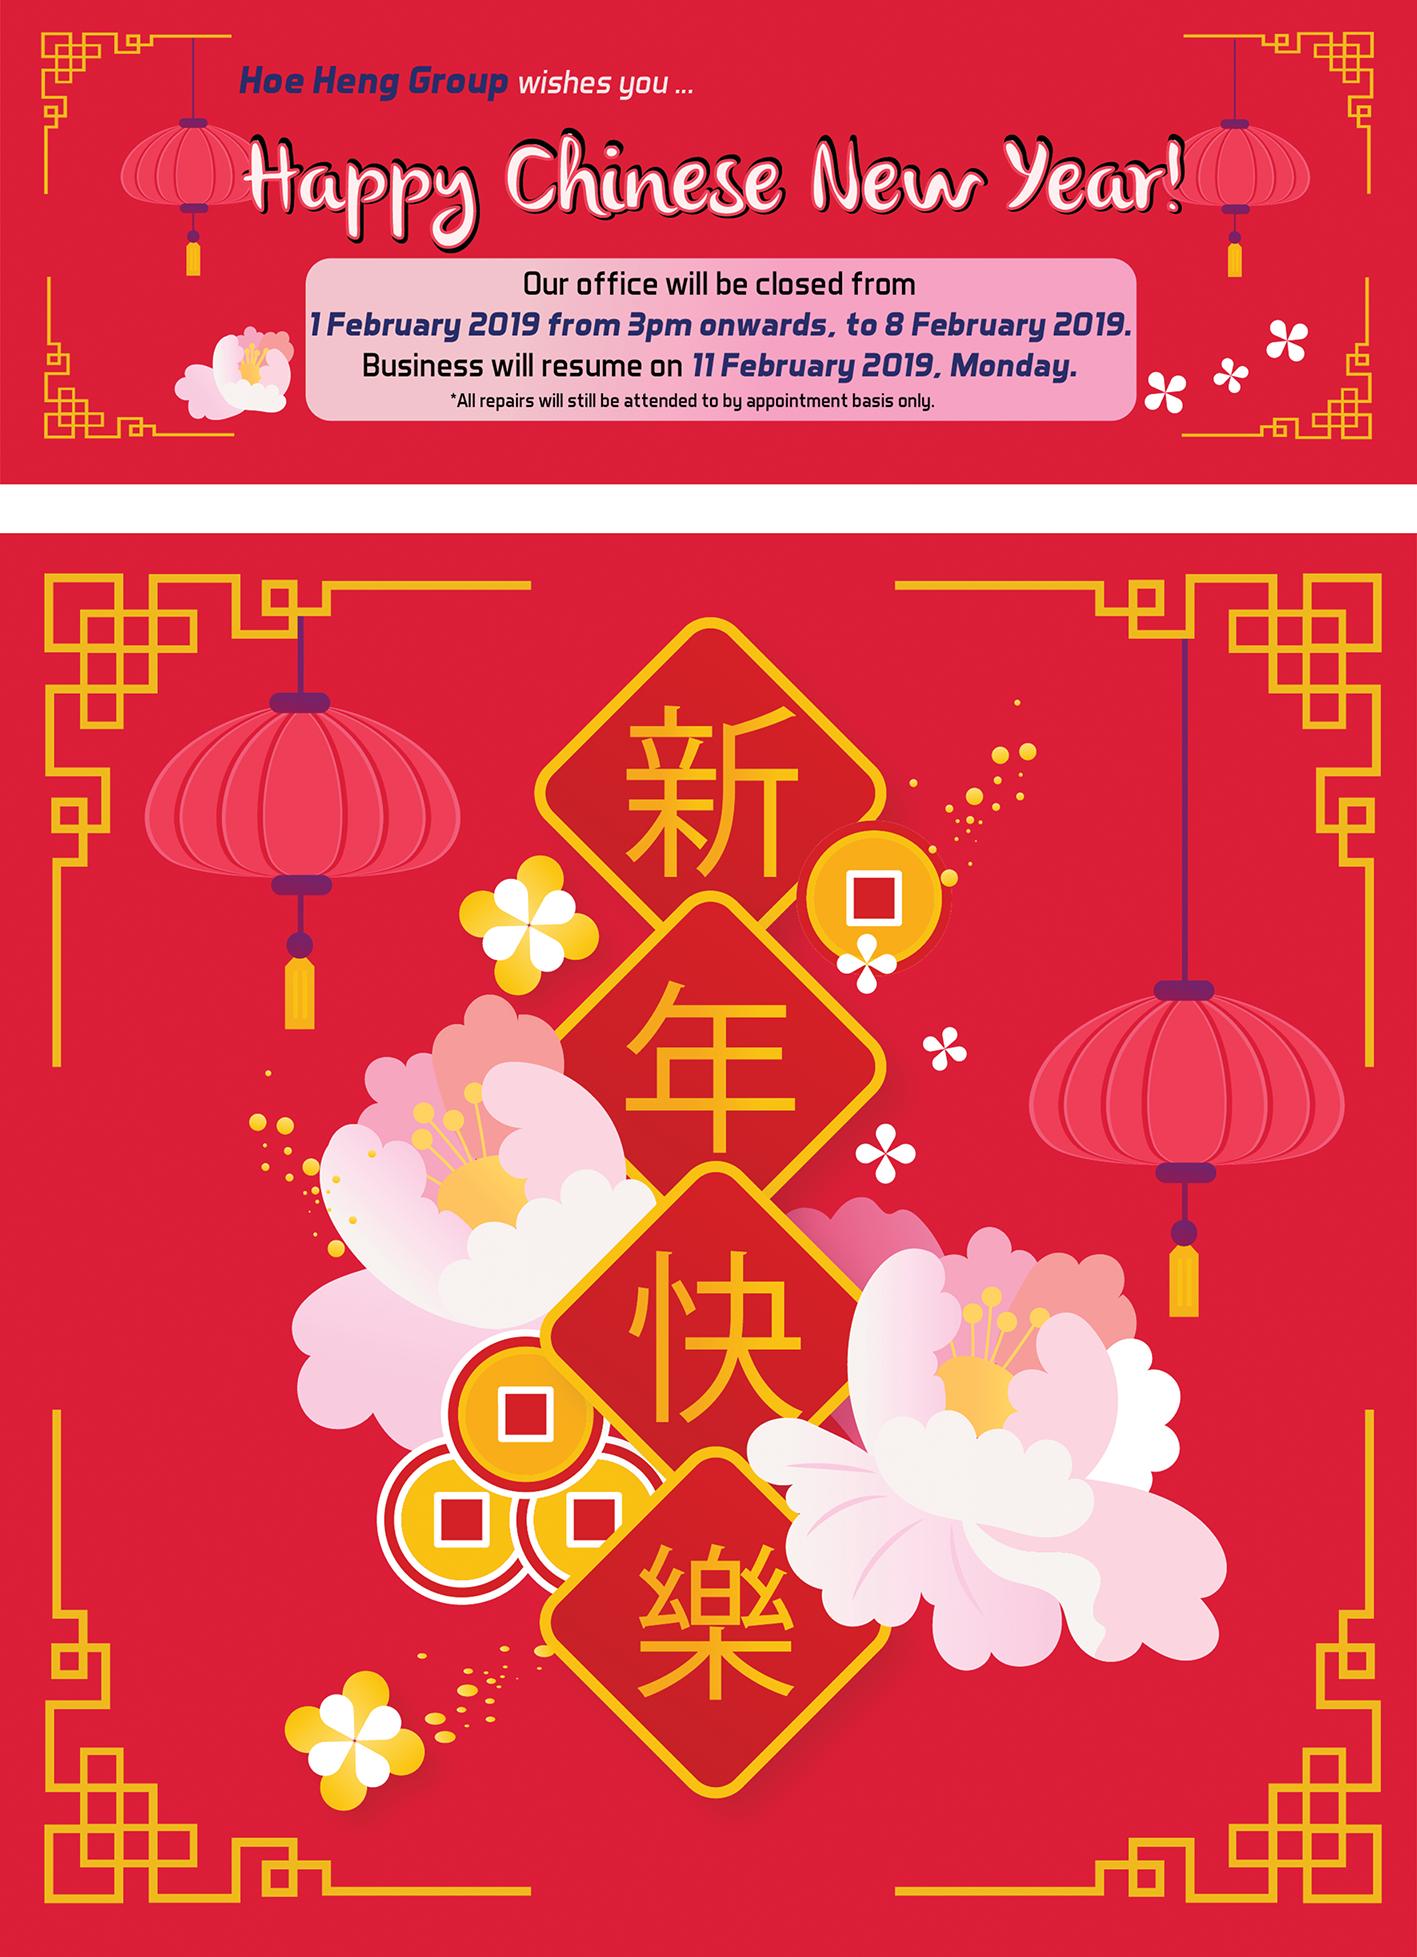 Happy Chinese New Year 2019!